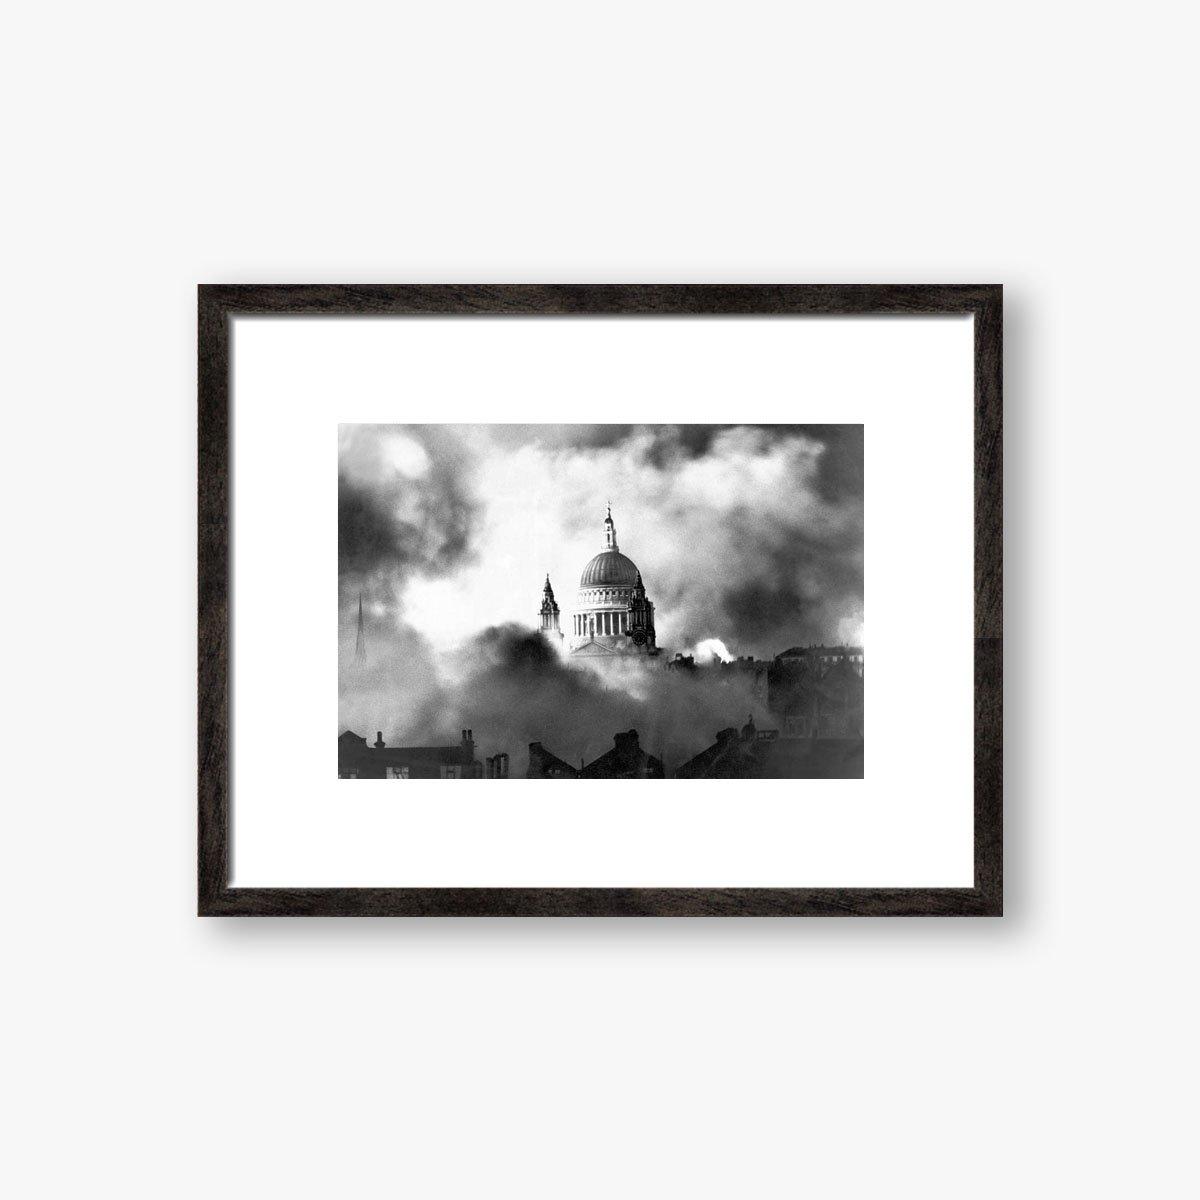 St. Paul's In The Blitz by Herbert Mason